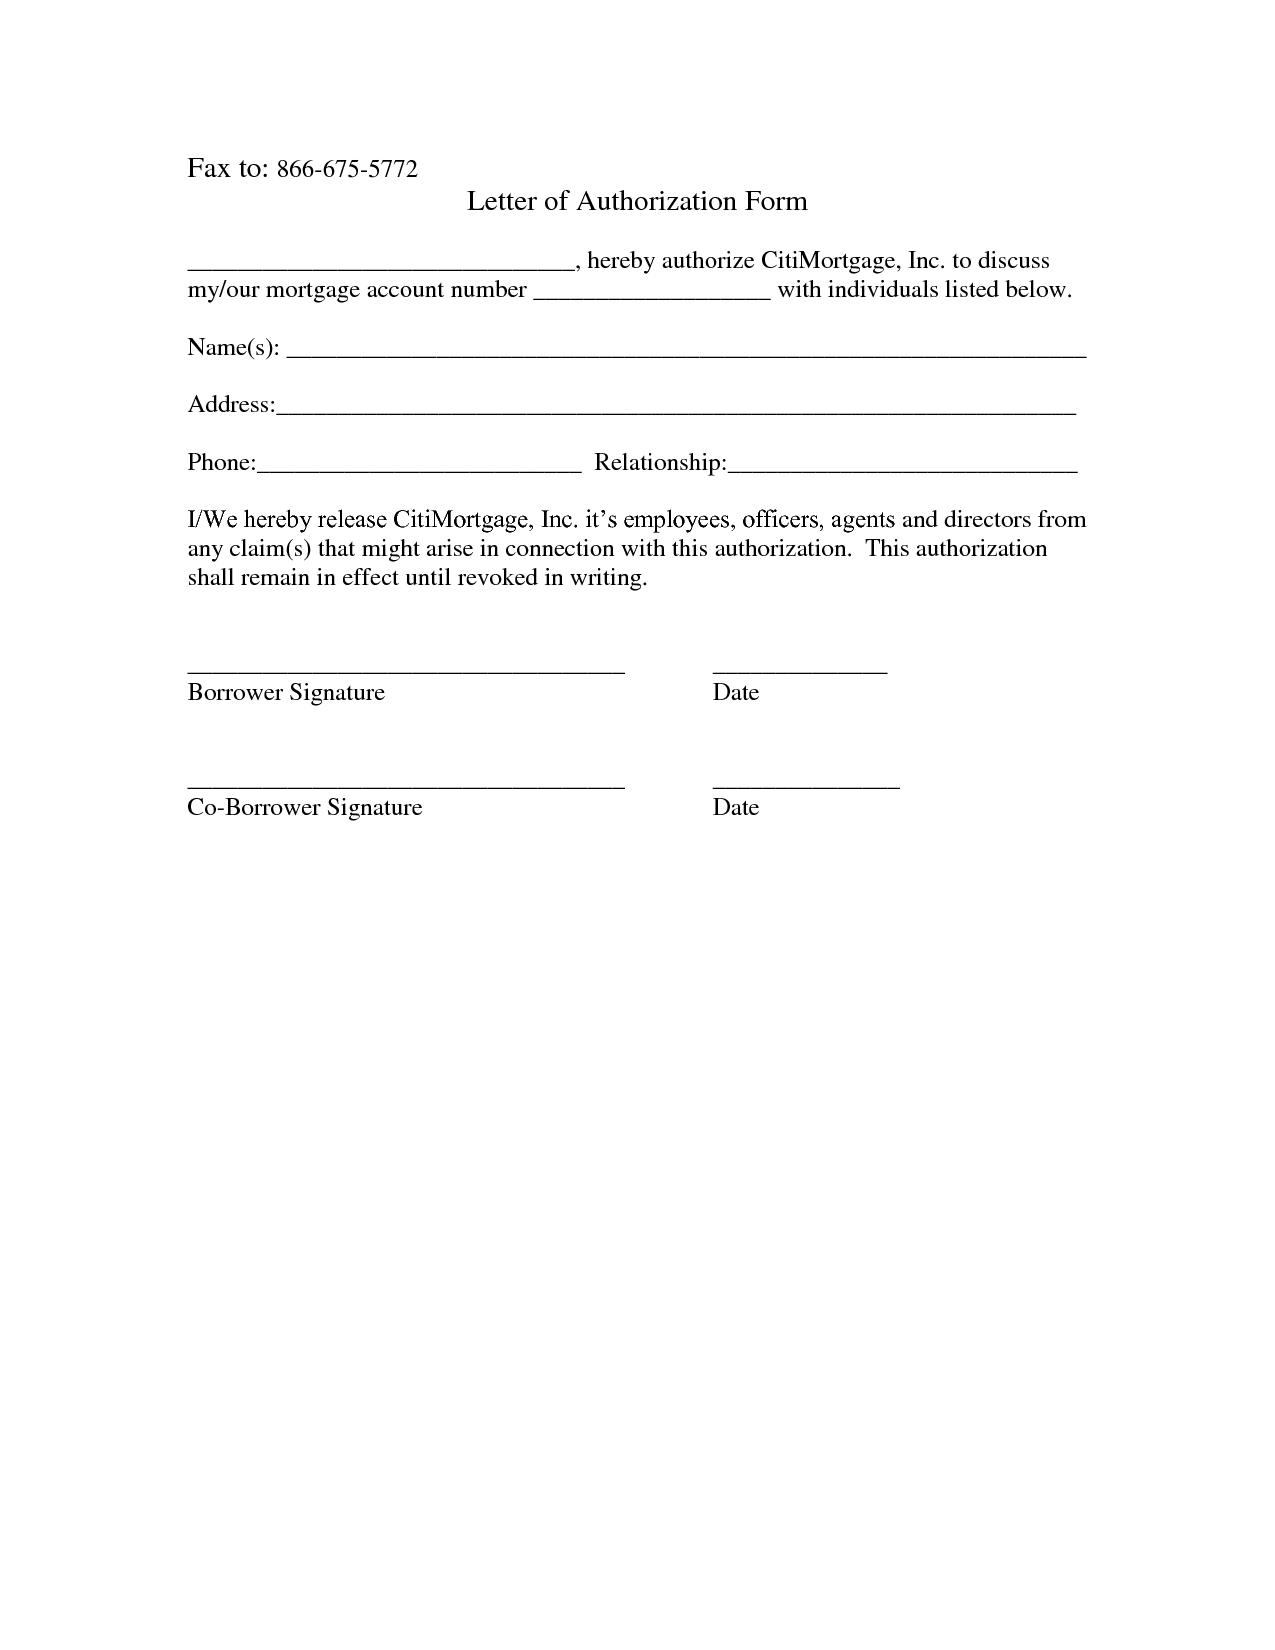 Authorization letter collect passport philippine embassy home authorization letter collect passport philippine embassy noc sample format for objection best free home design idea inspiration spiritdancerdesigns Images